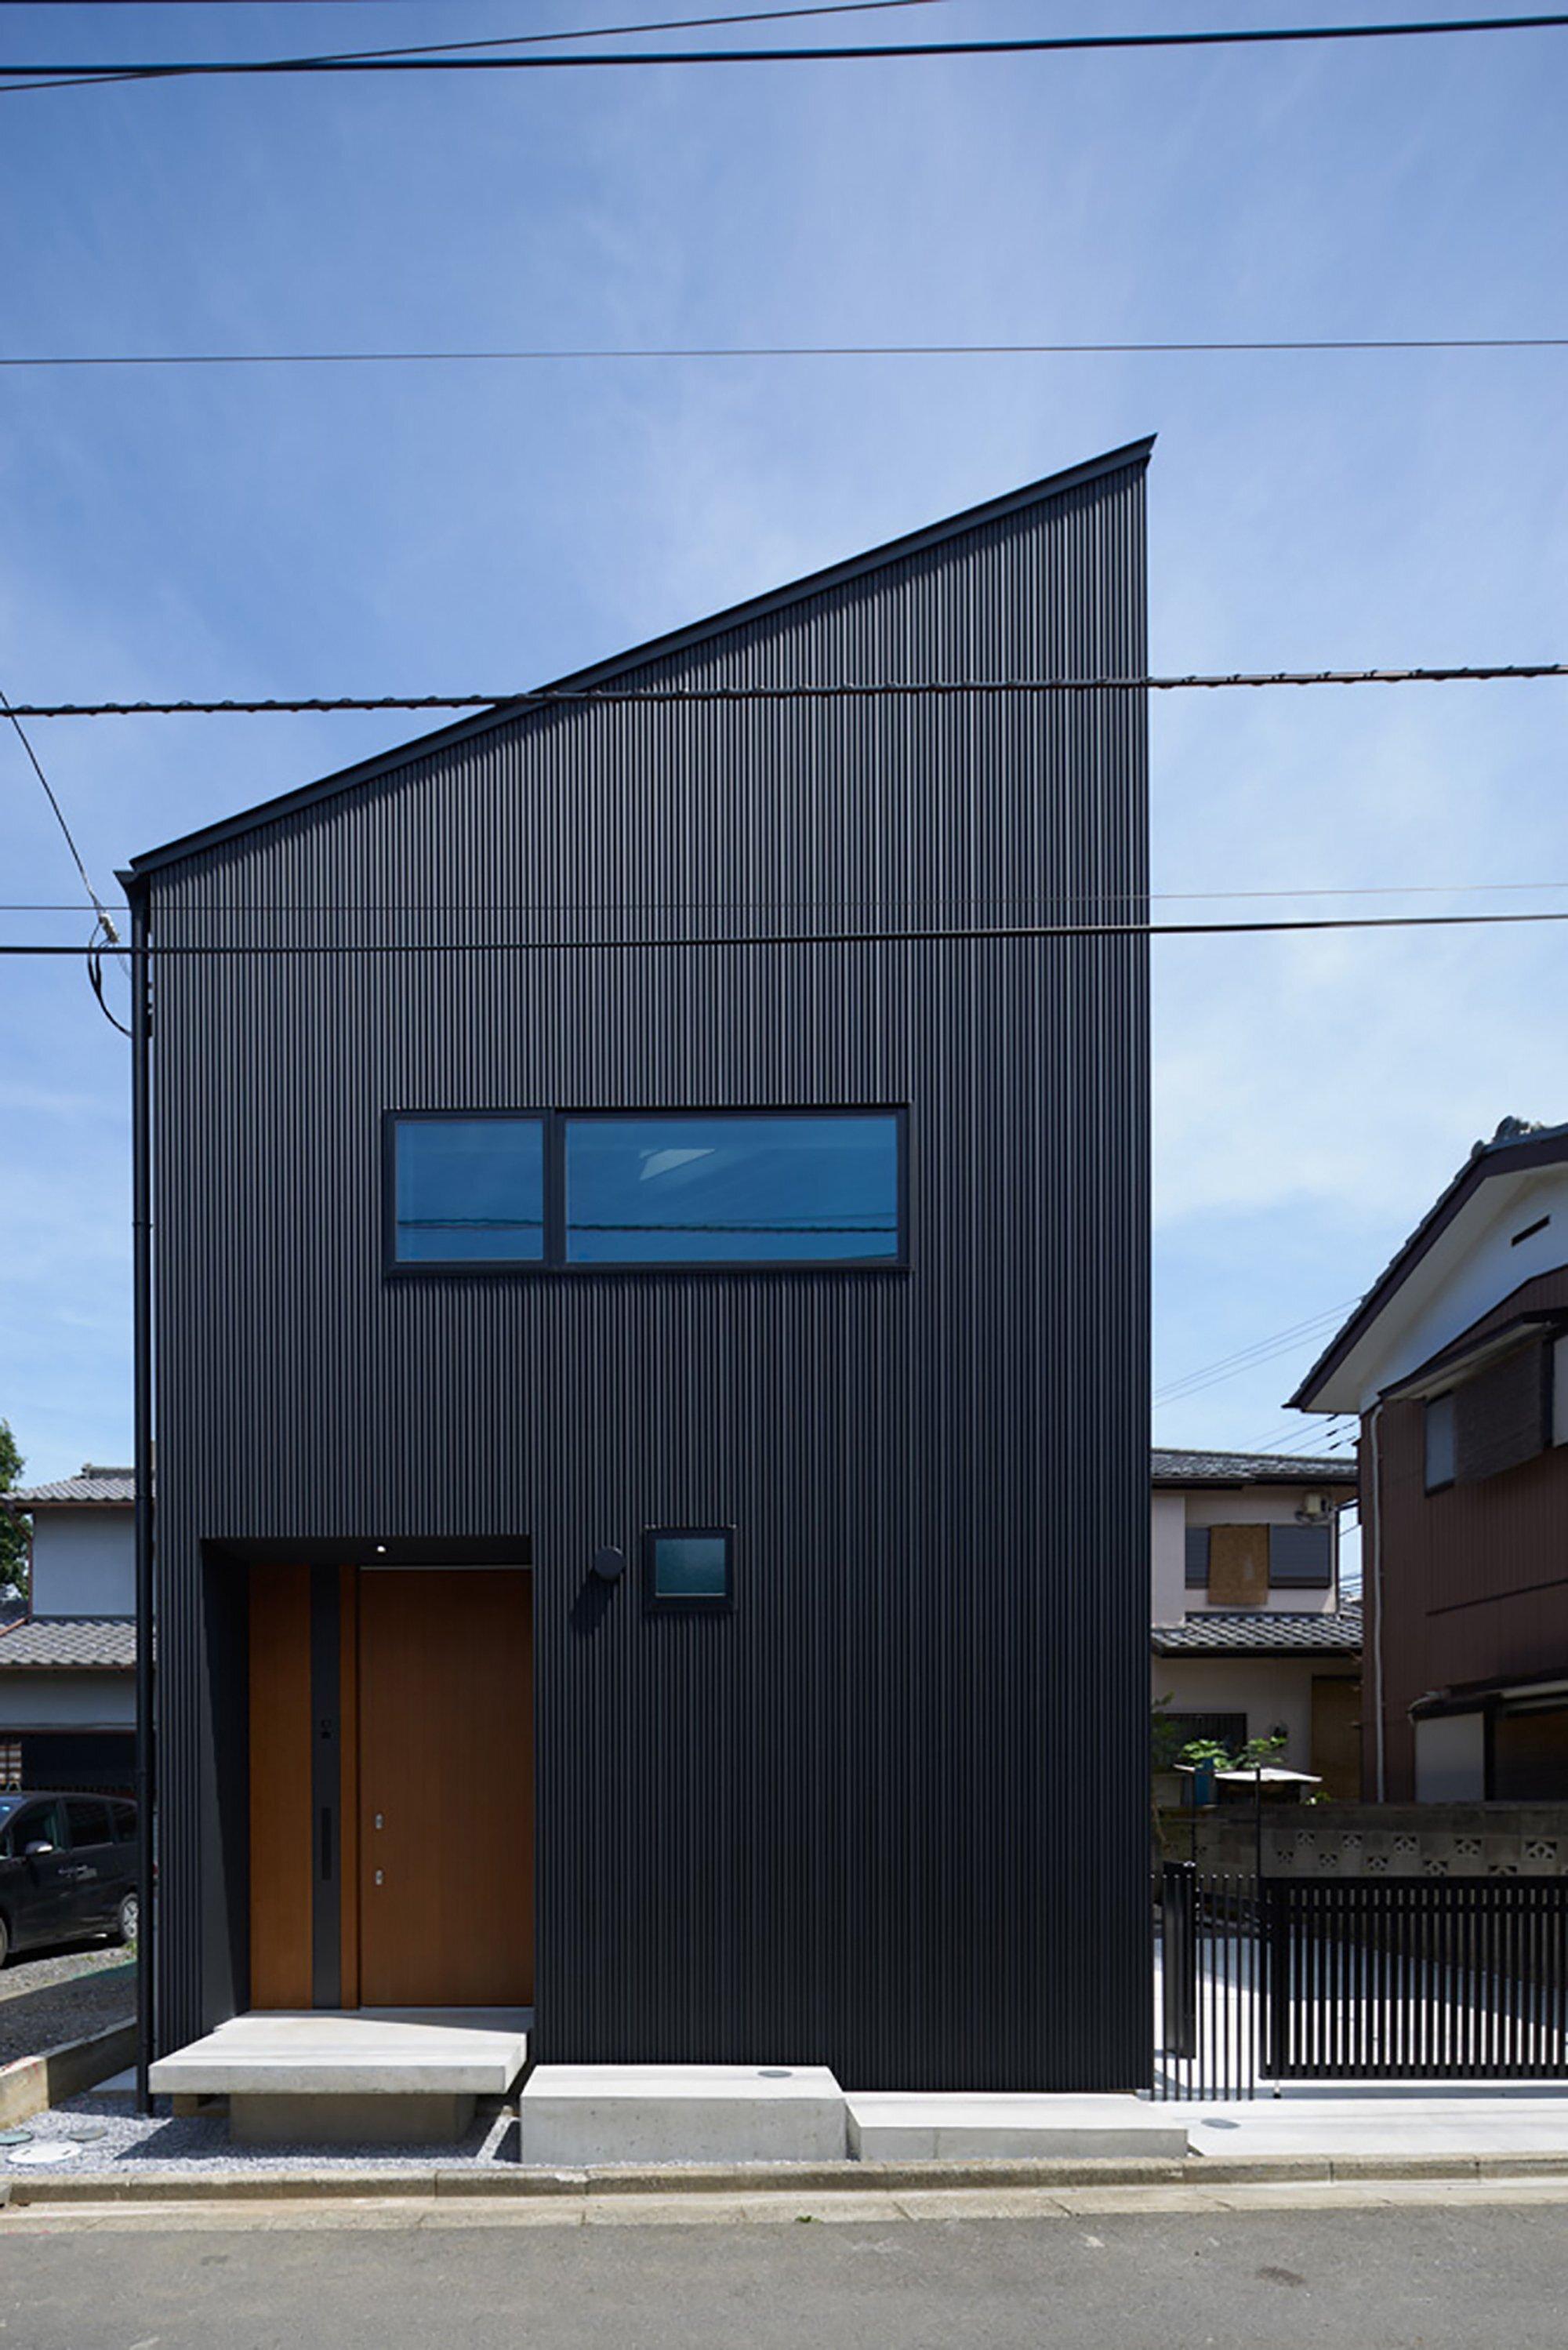 House Ageo   Small House   KASA Architects   Japan   Exterior   Humble Homes